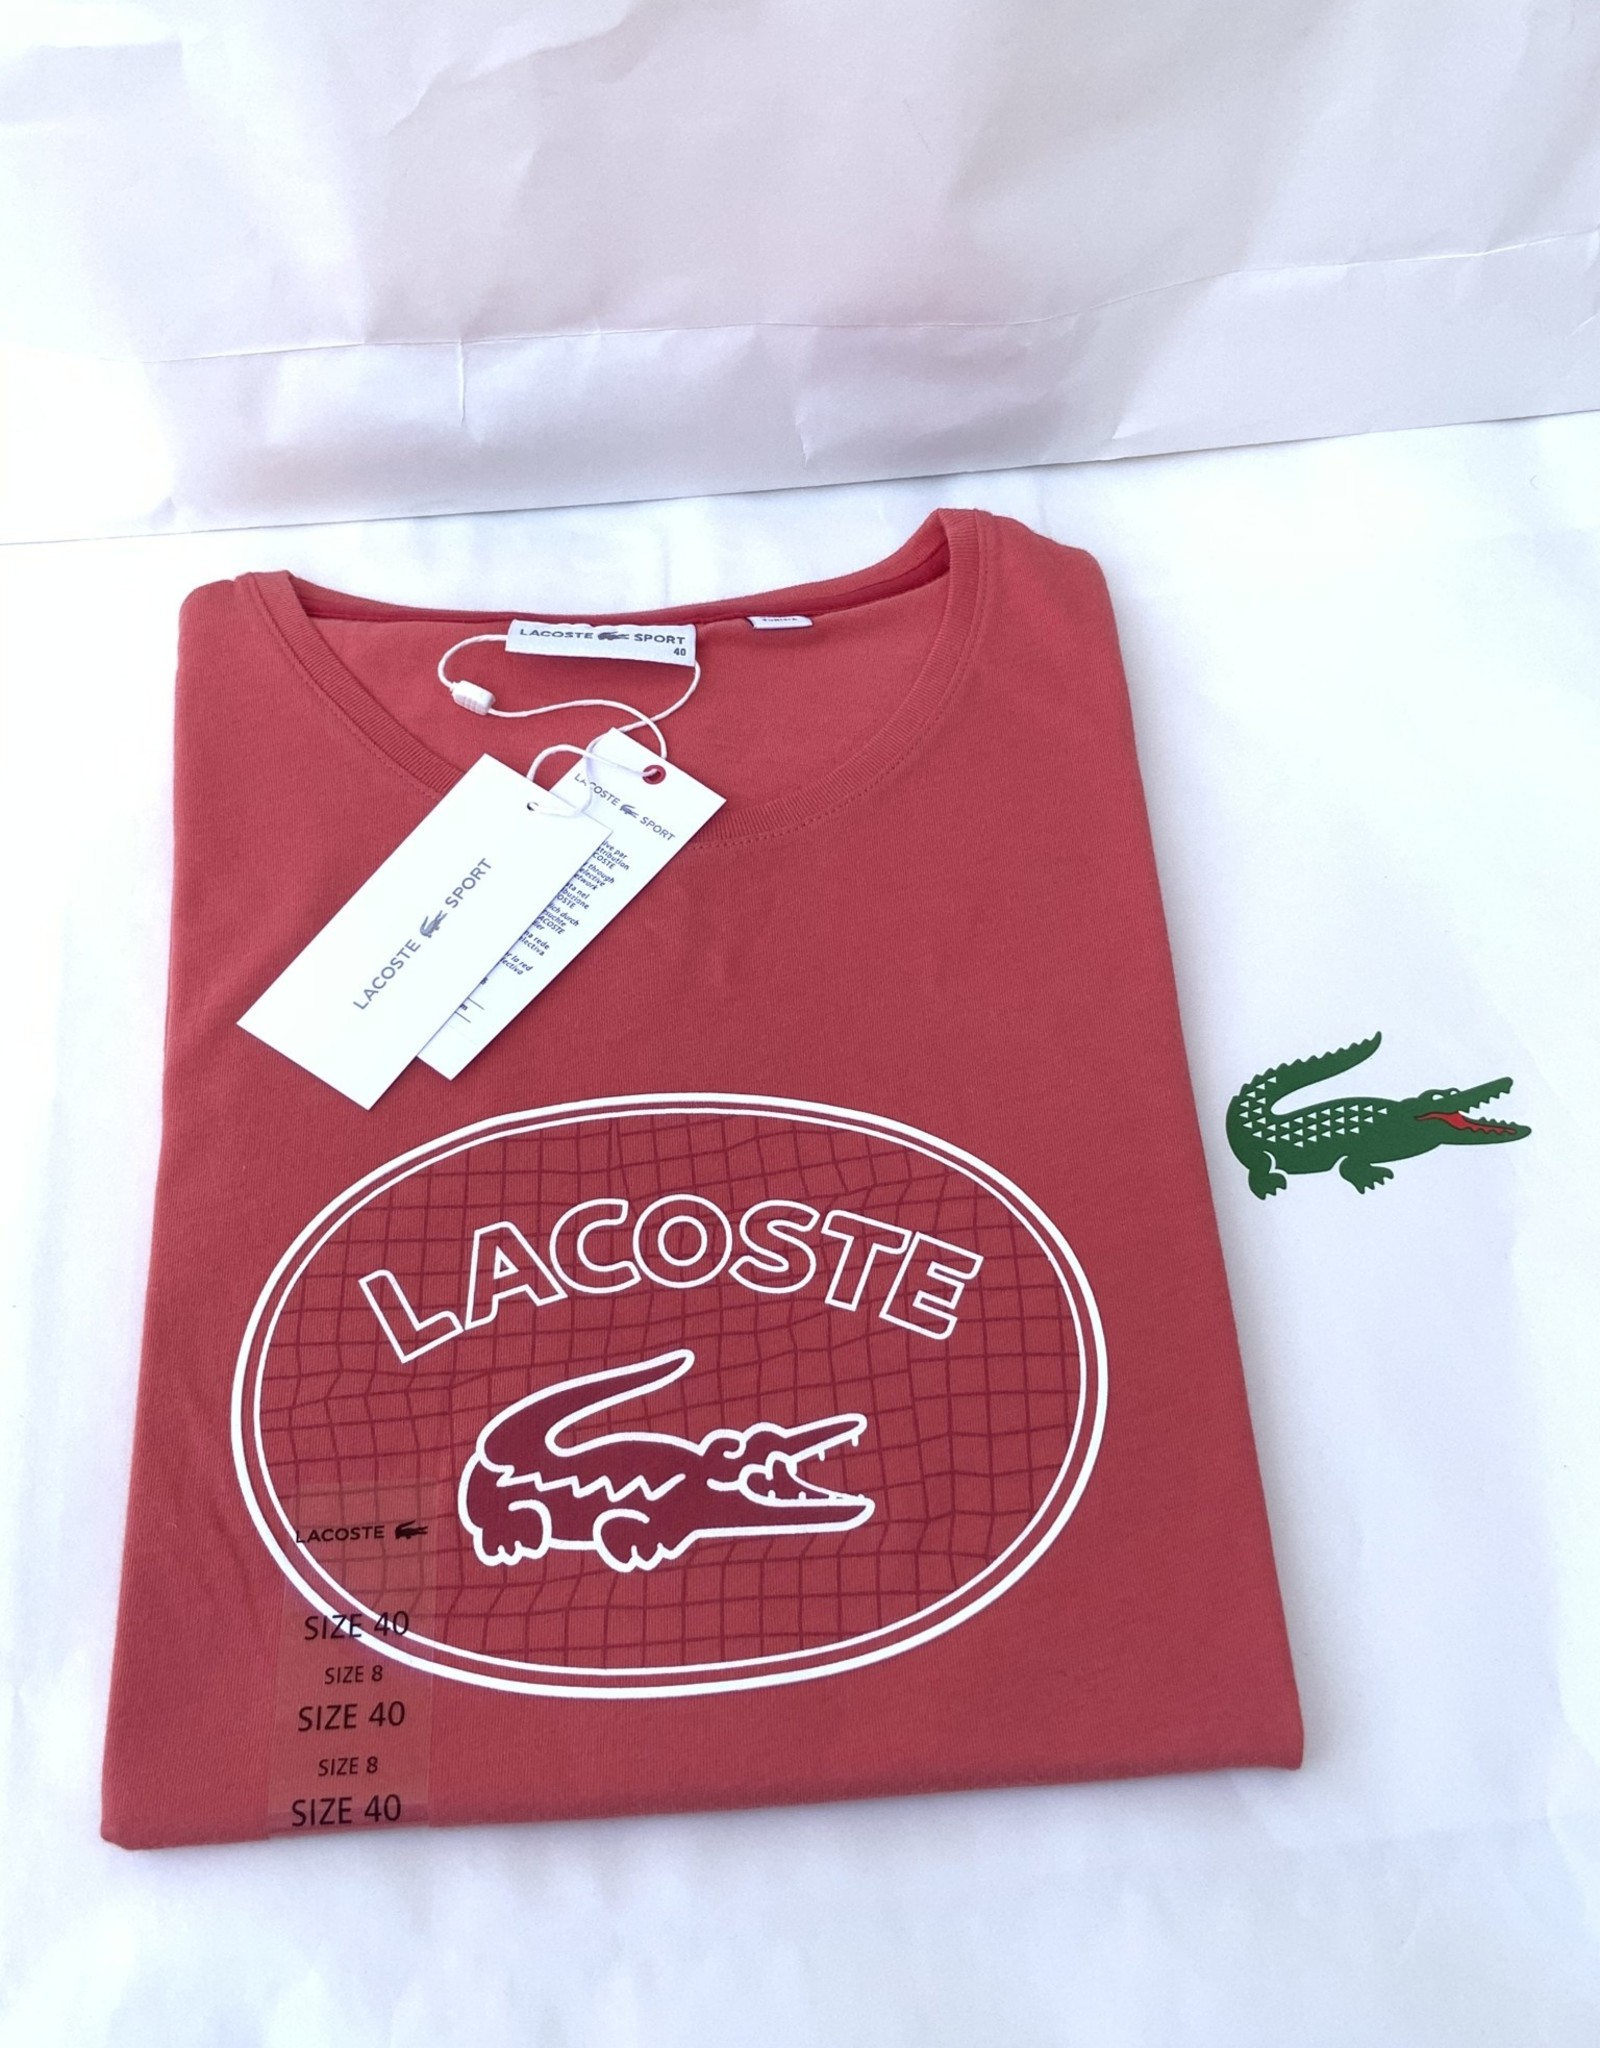 Lacoste Lacoste T-Shirt Women's Sport Crew Neck Graphic Logo